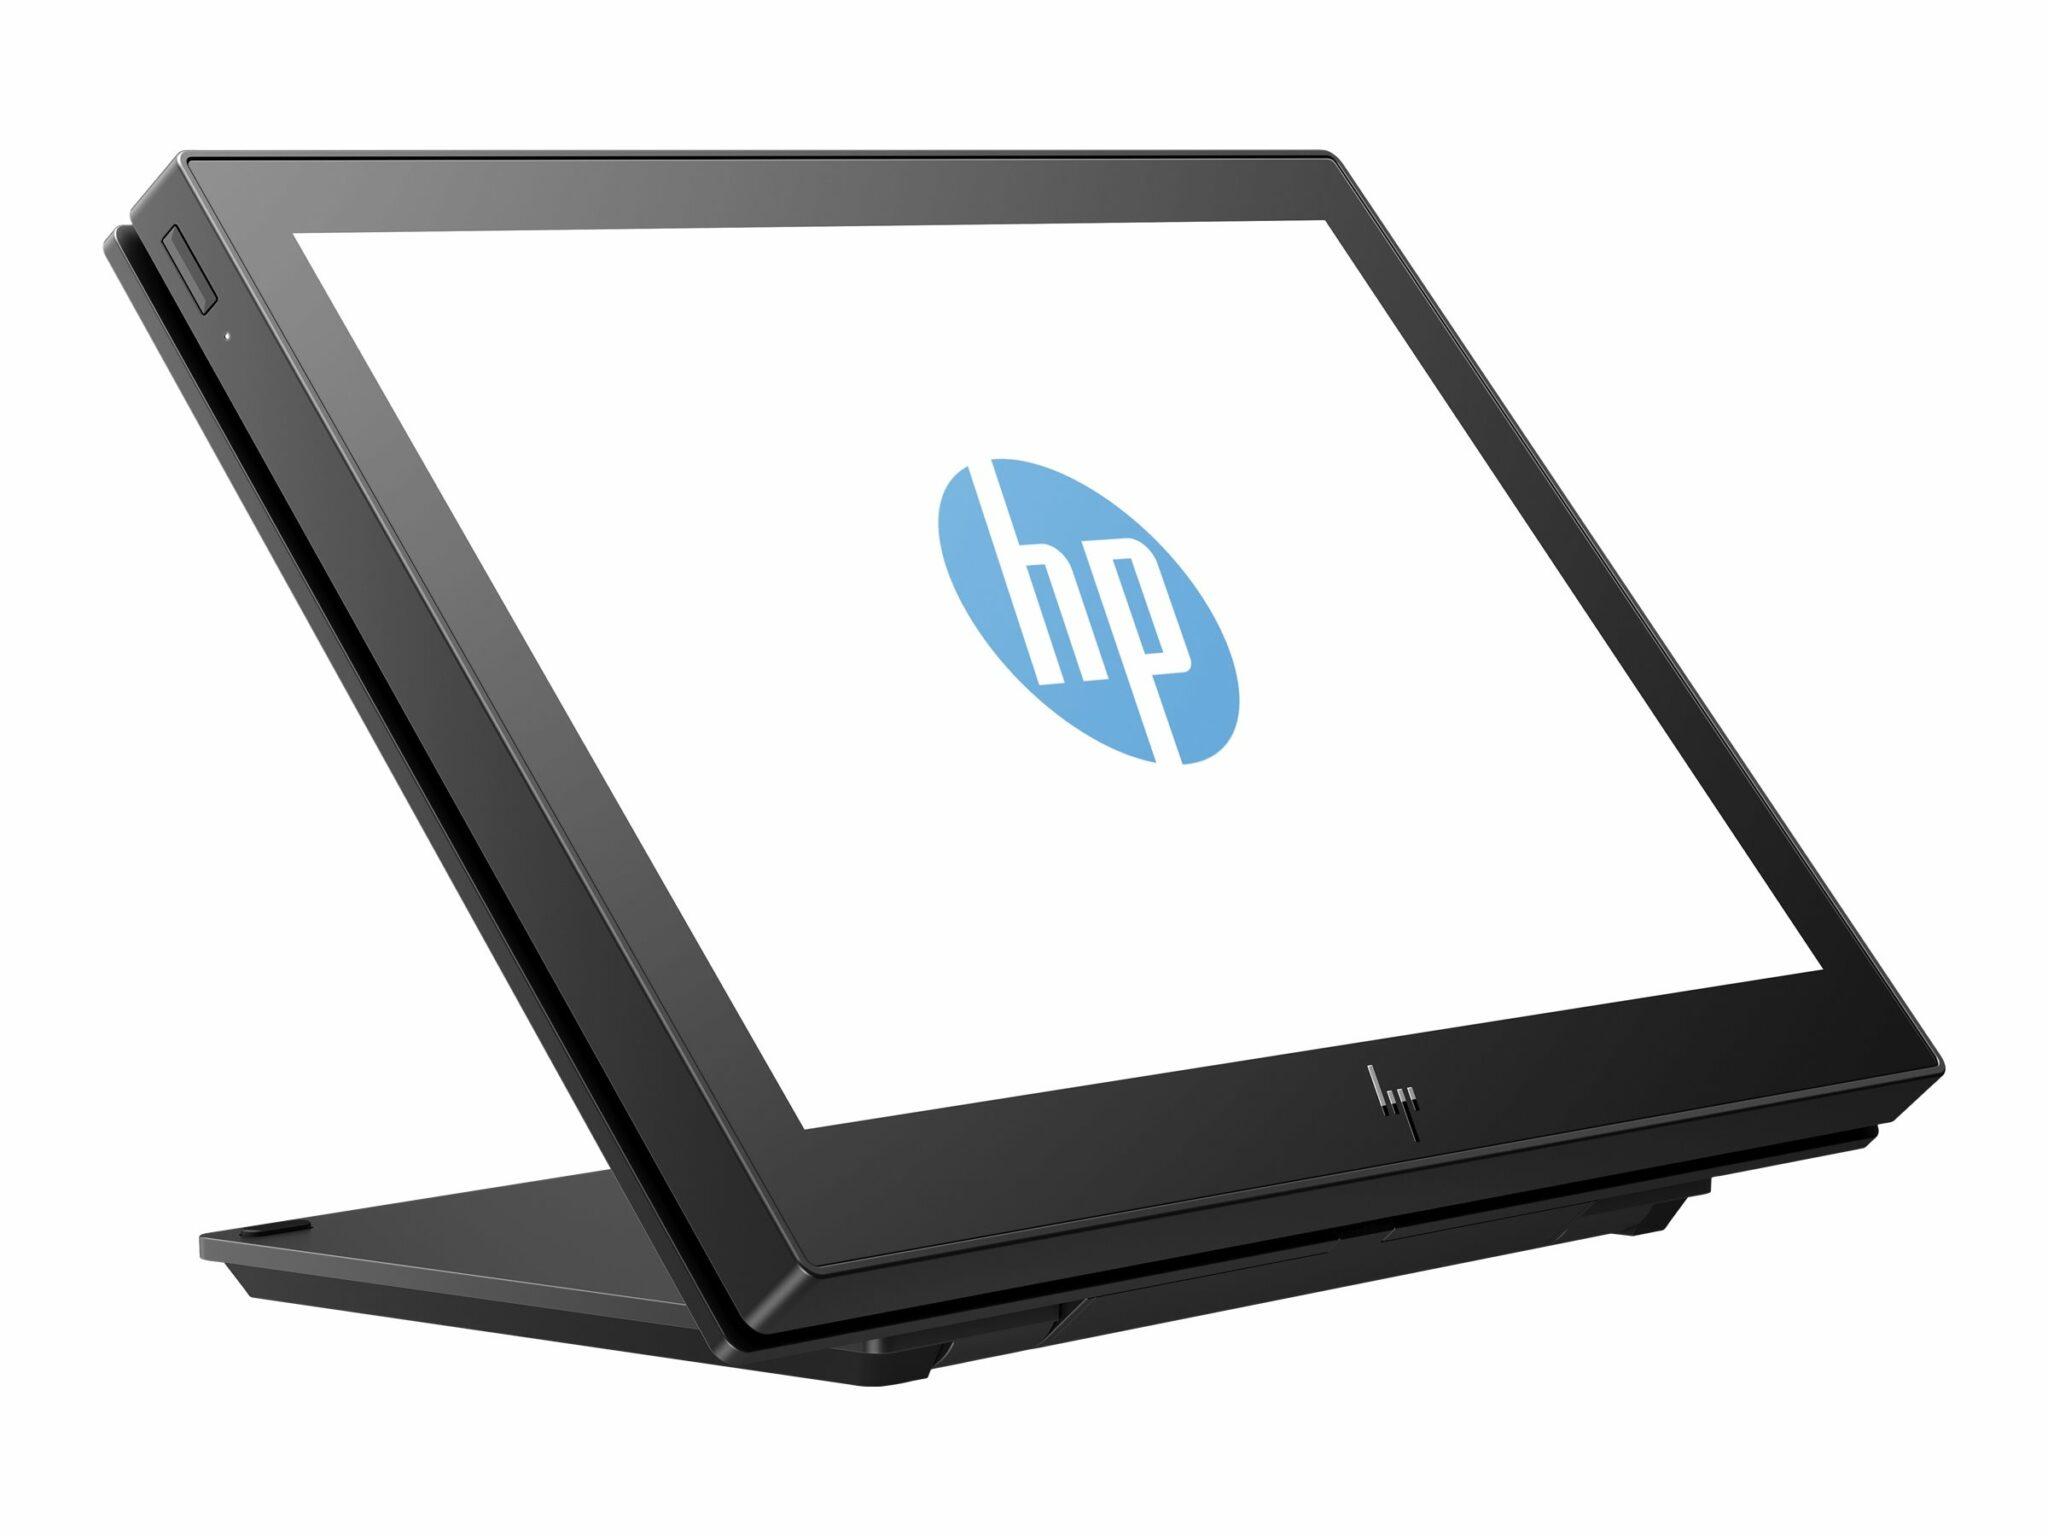 HP ElitePOS 10t Display No localization